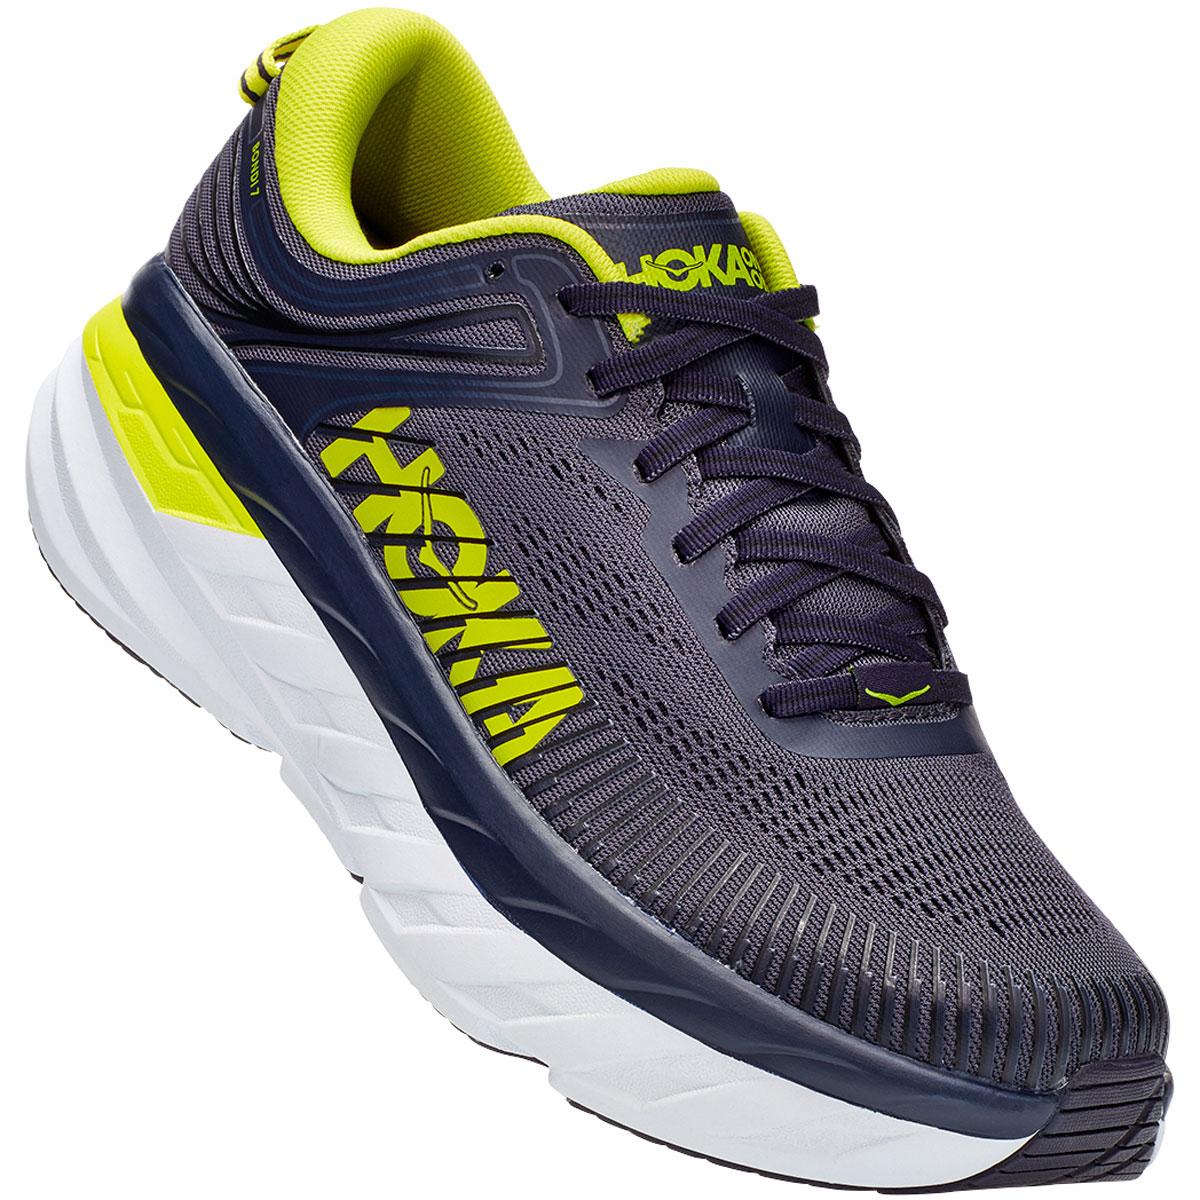 Men's Hoka One One Bondi 7 Running Shoe - Color: Odyssey Grey/Deep Well - Size: 7 - Width: Regular, Odyssey Grey/Deep Well, large, image 4